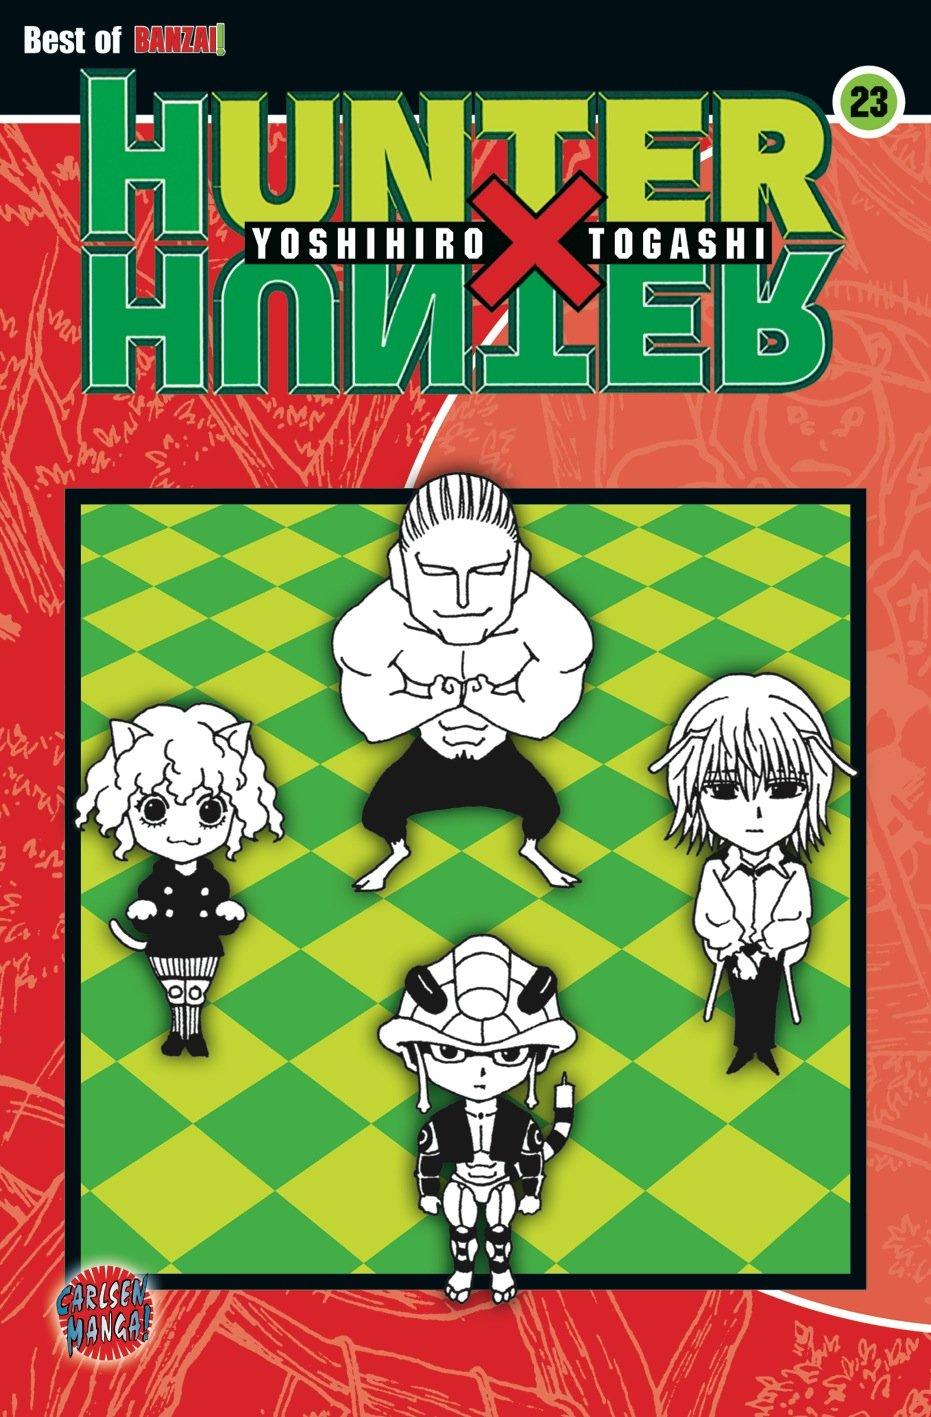 Hunter X Hunter, Band 23 Taschenbuch – 27. August 2009 Yoshihiro Togashi Hiro Yamada Carlsen 3551765936